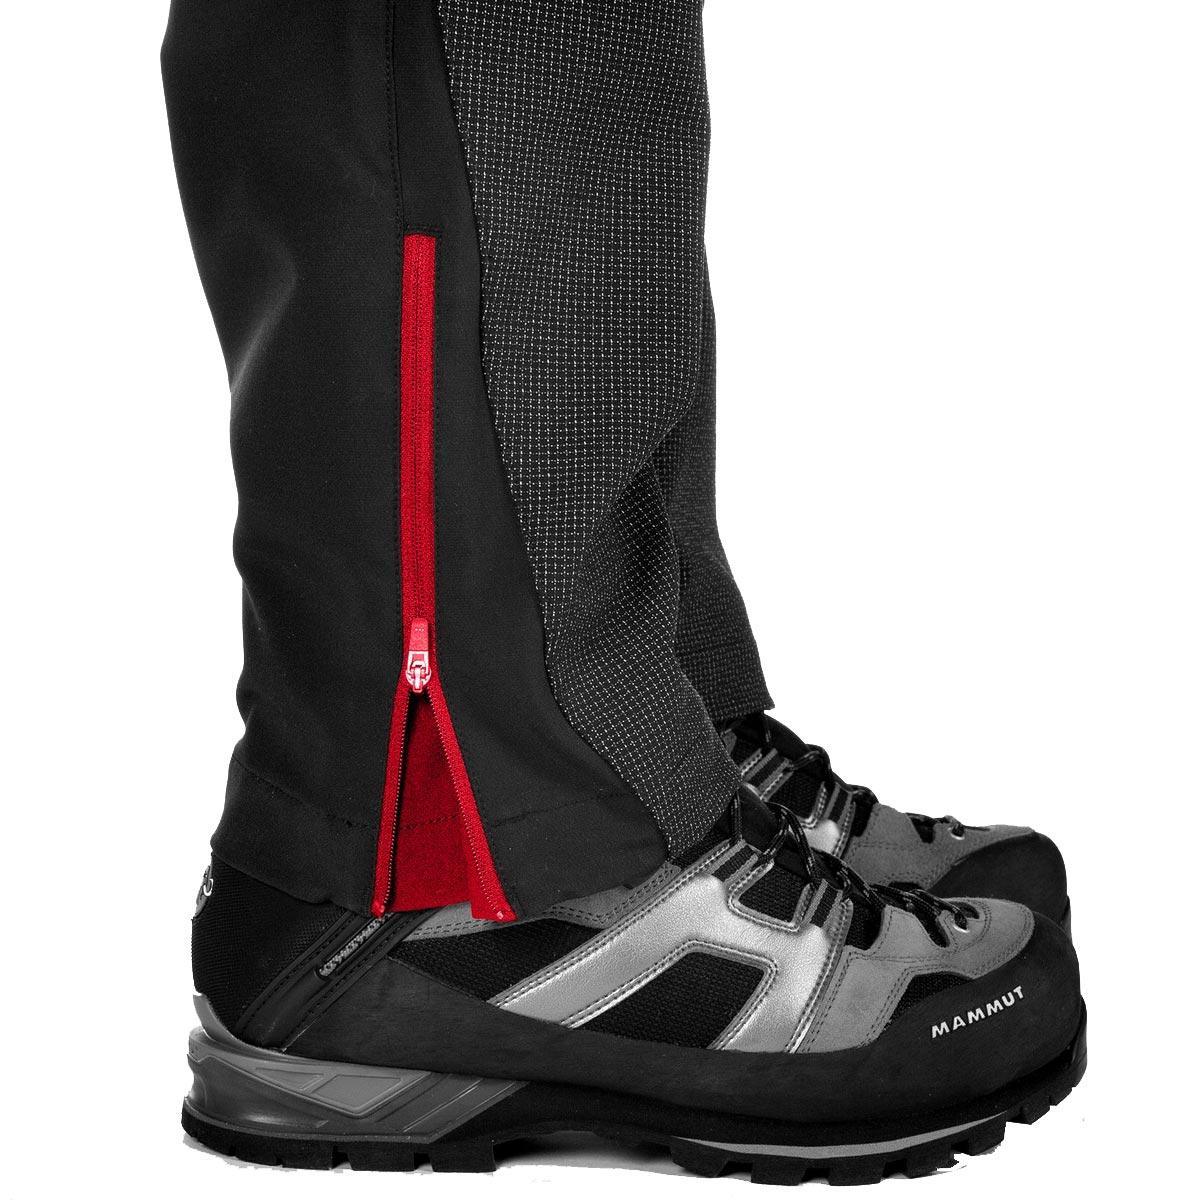 new product 12a3d 3b002 Base Jump SO Pant, men's